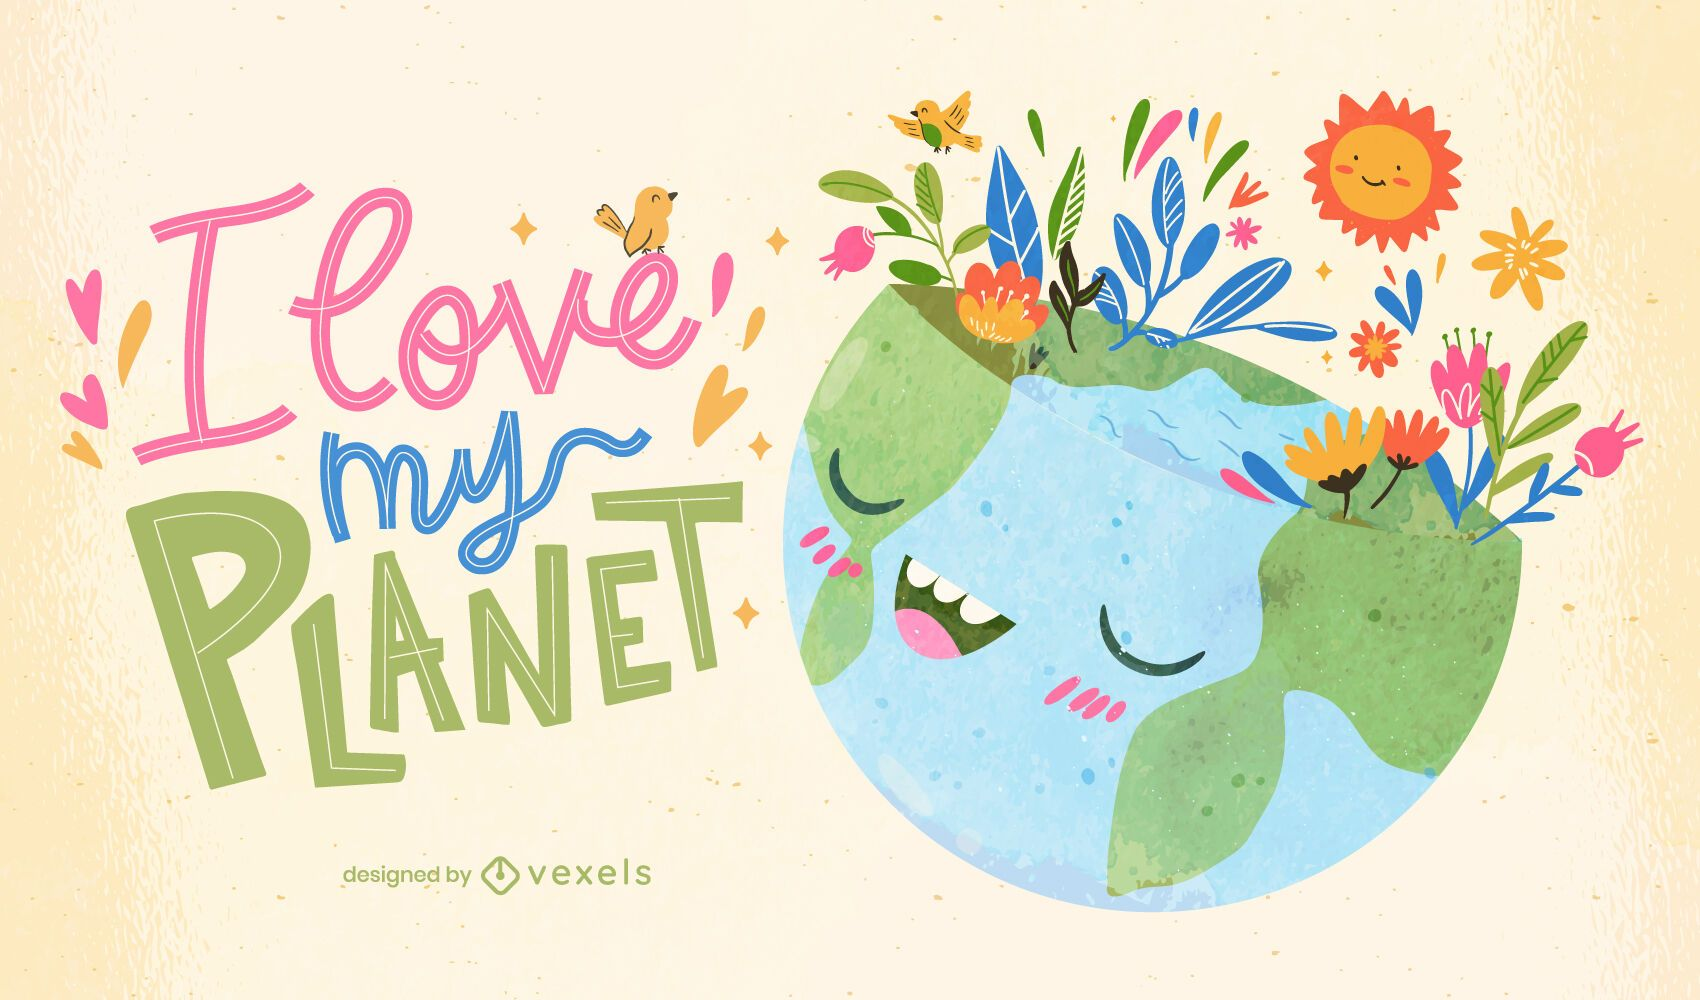 Love my planet illustration